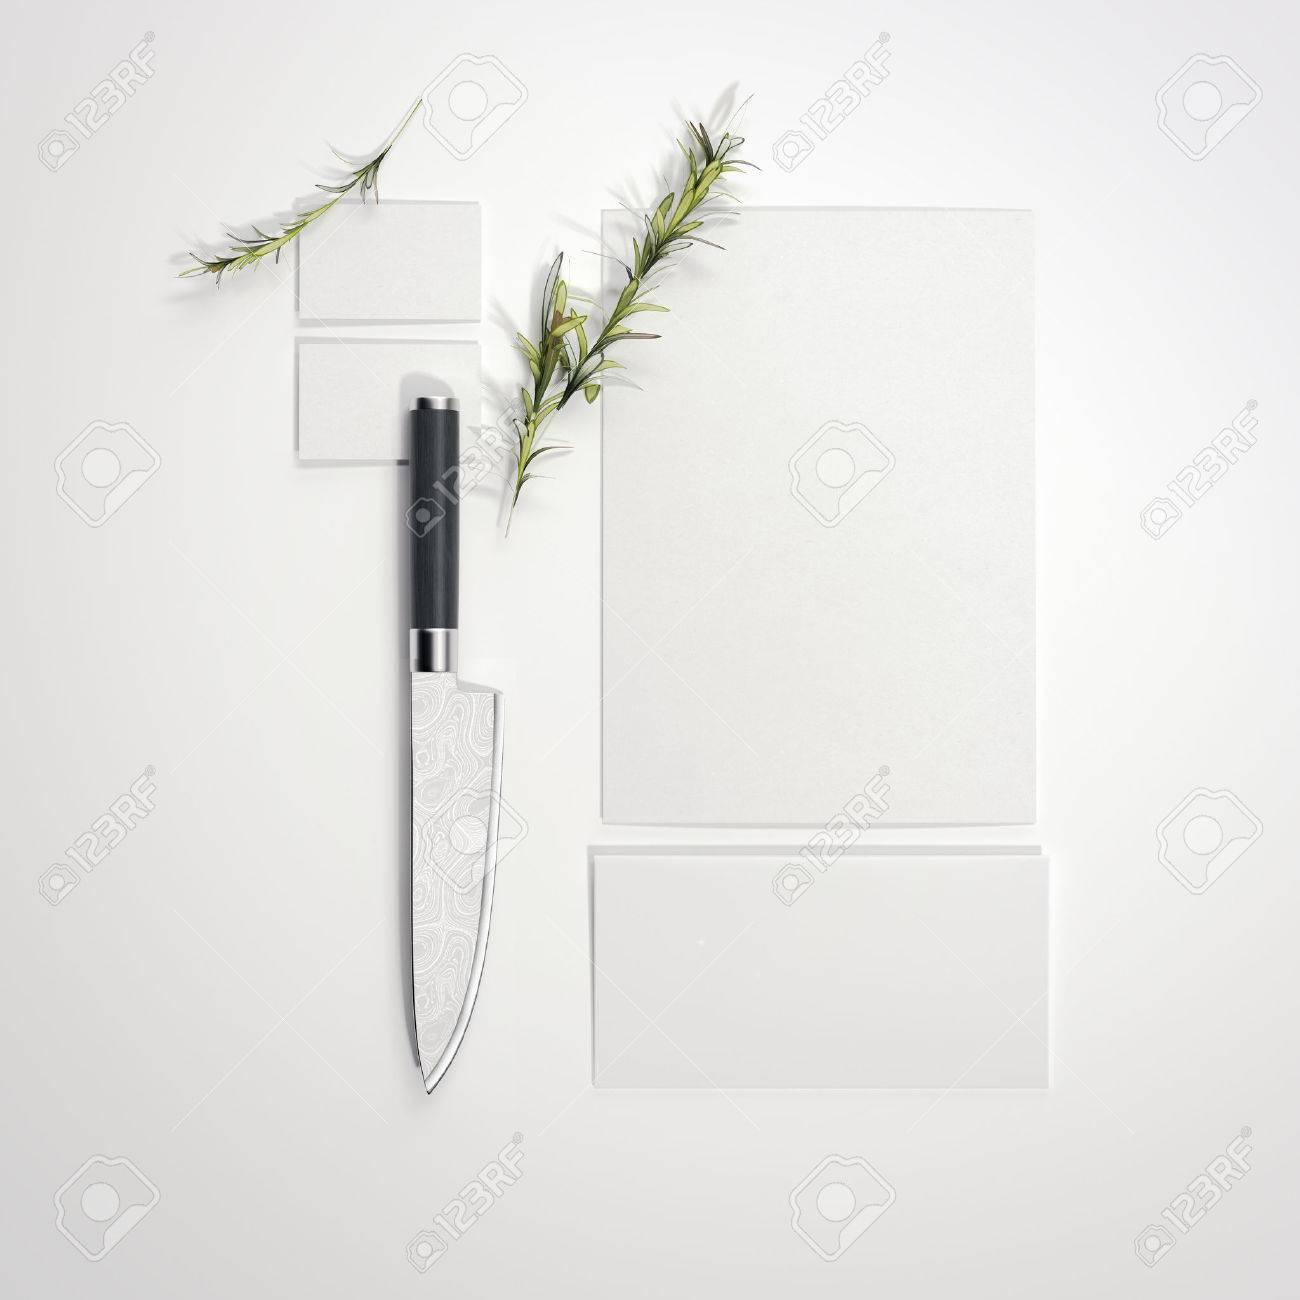 restaurant mockup with sharp knife on bright floor 3d rendering